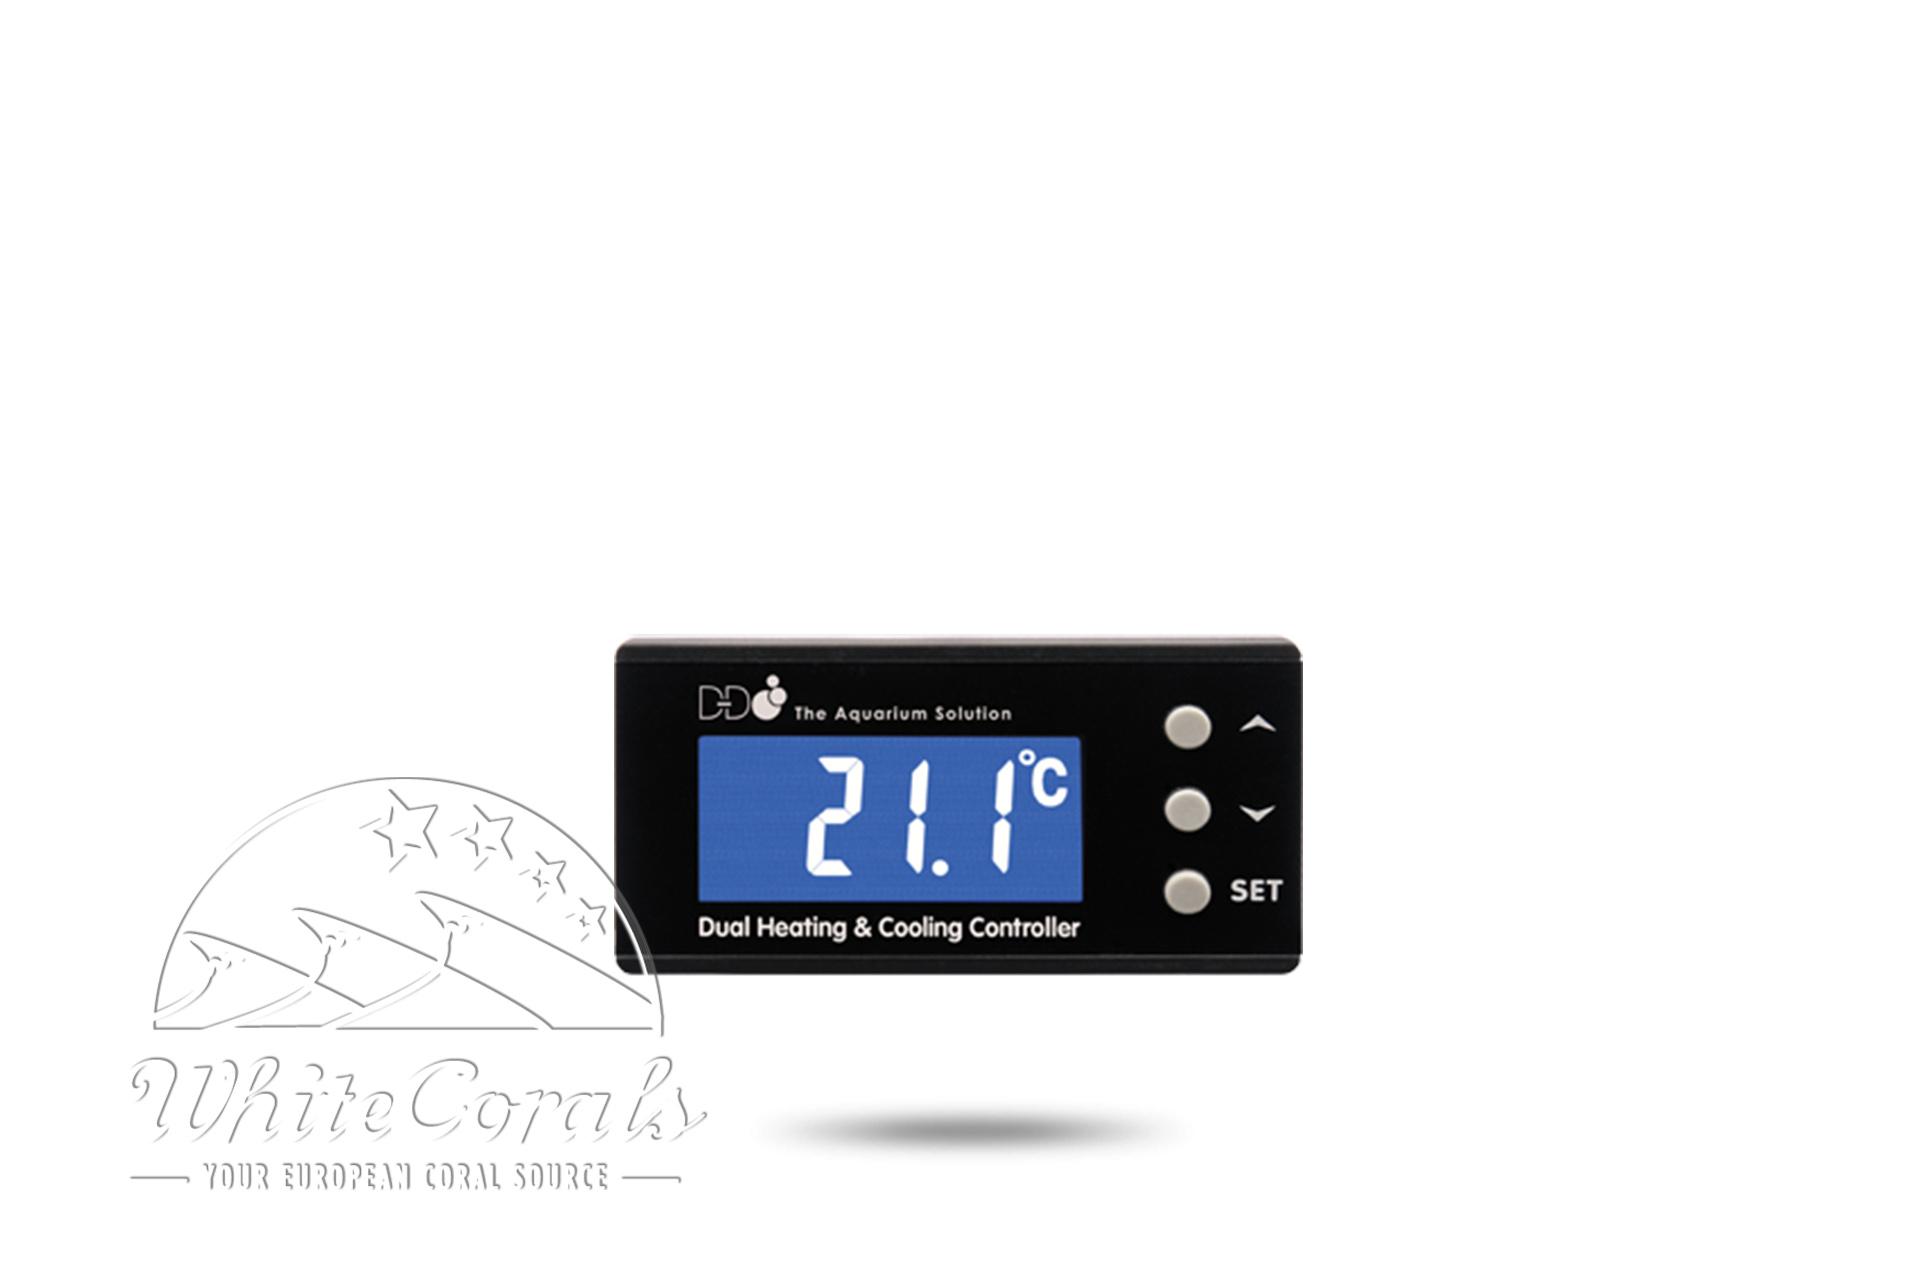 D-D Heating and cooling regulator